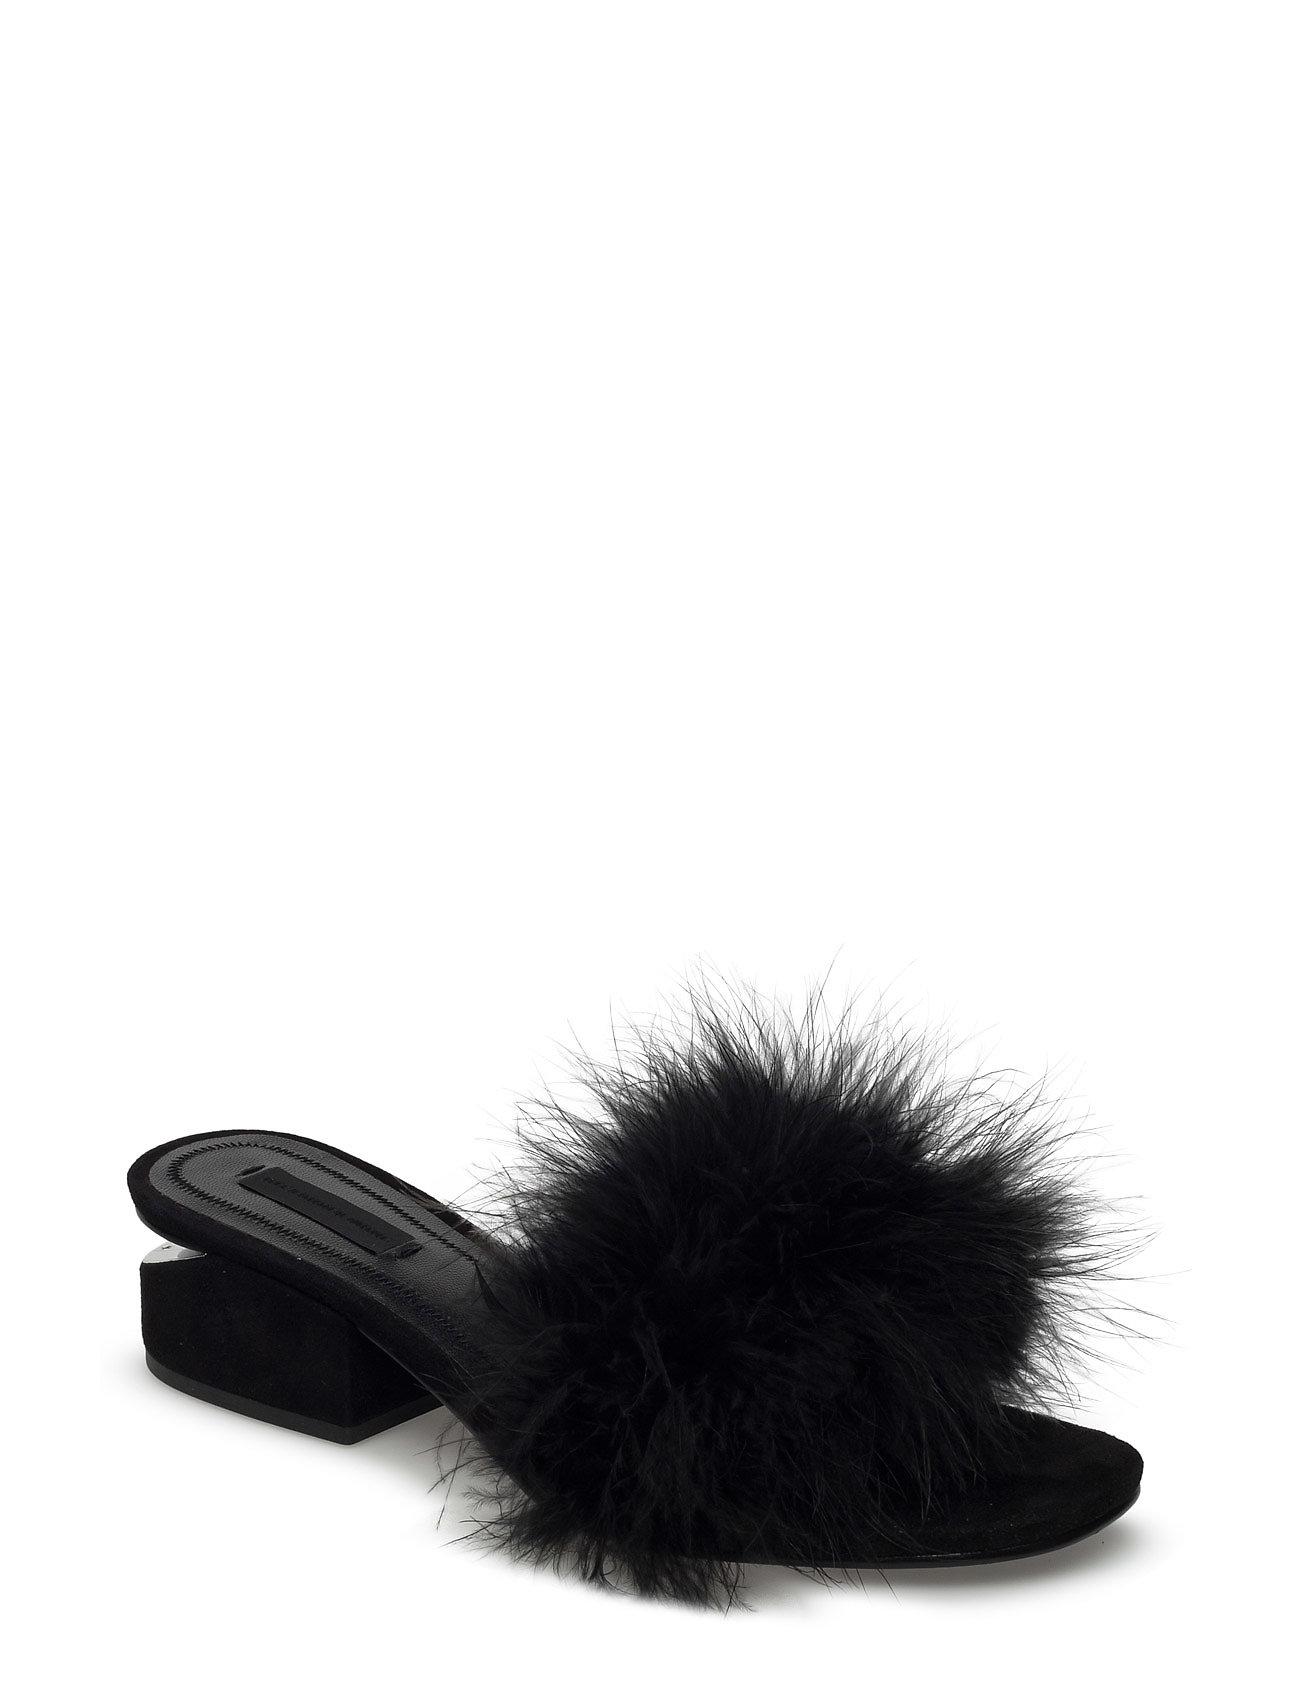 Lou black marabou feather/kid suede/rhodium fra alexander wang på boozt.com dk